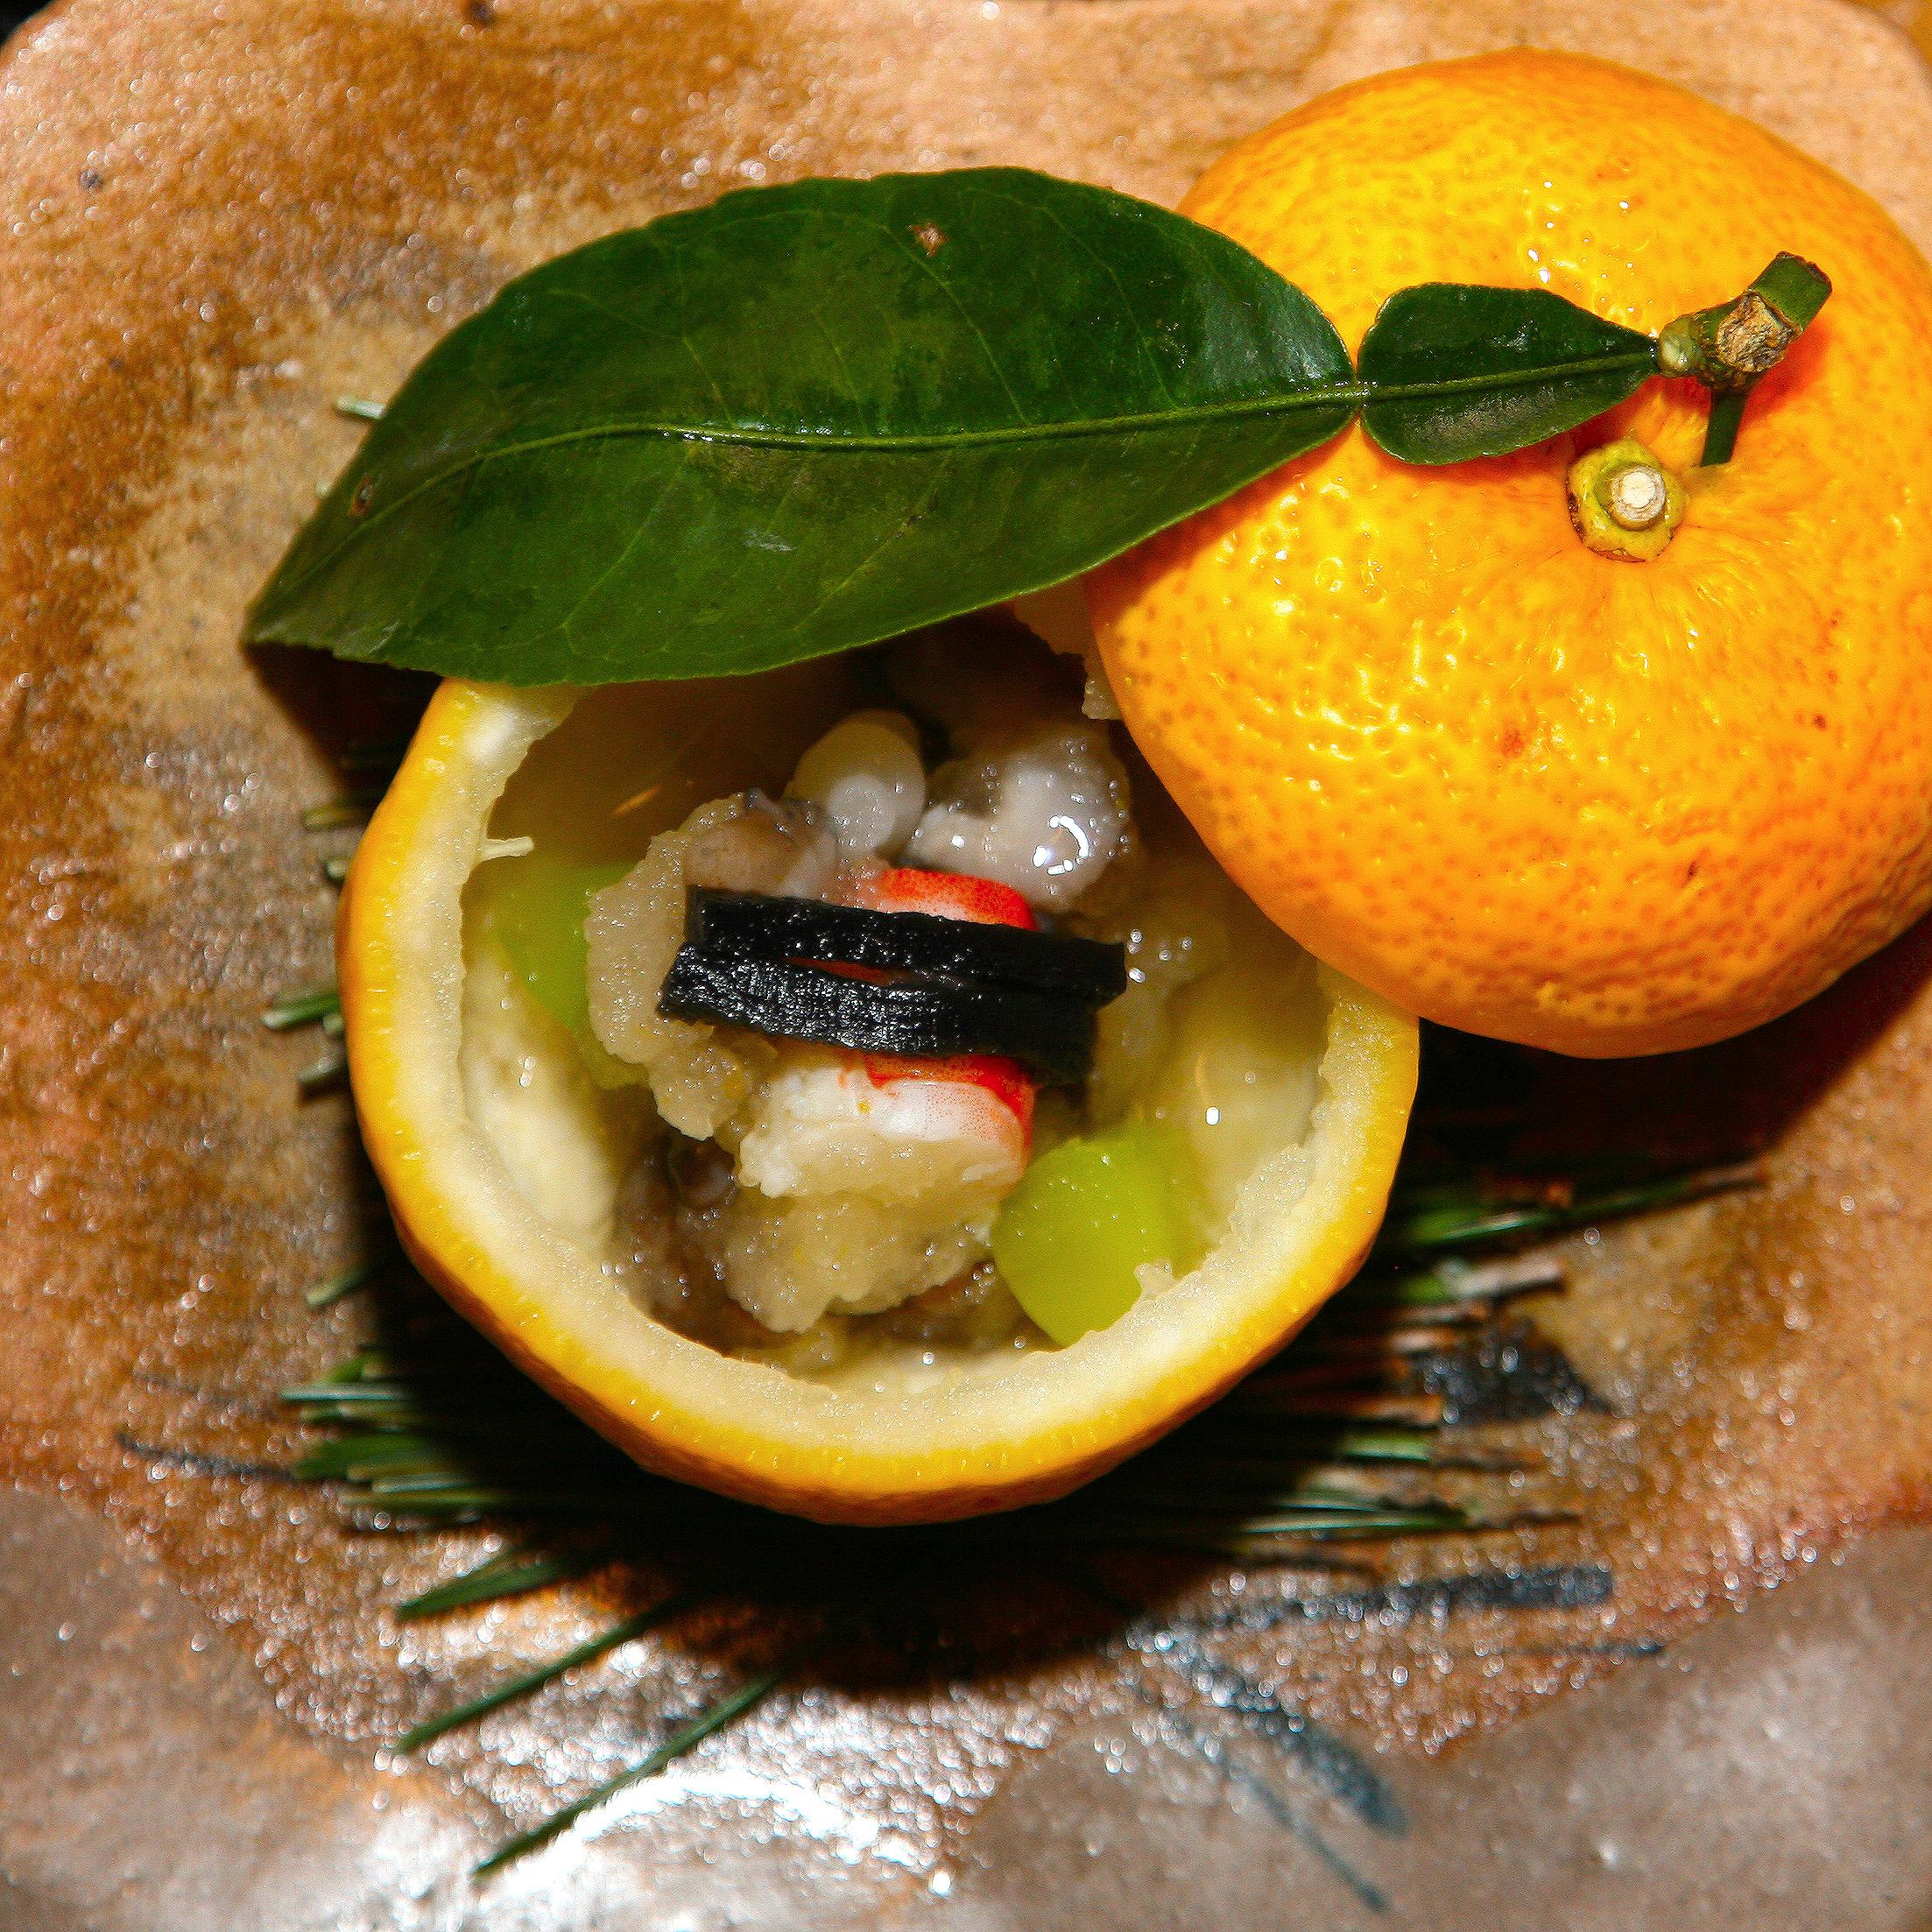 Takamura, Tokyo - Crab and octopus in citrus gelee